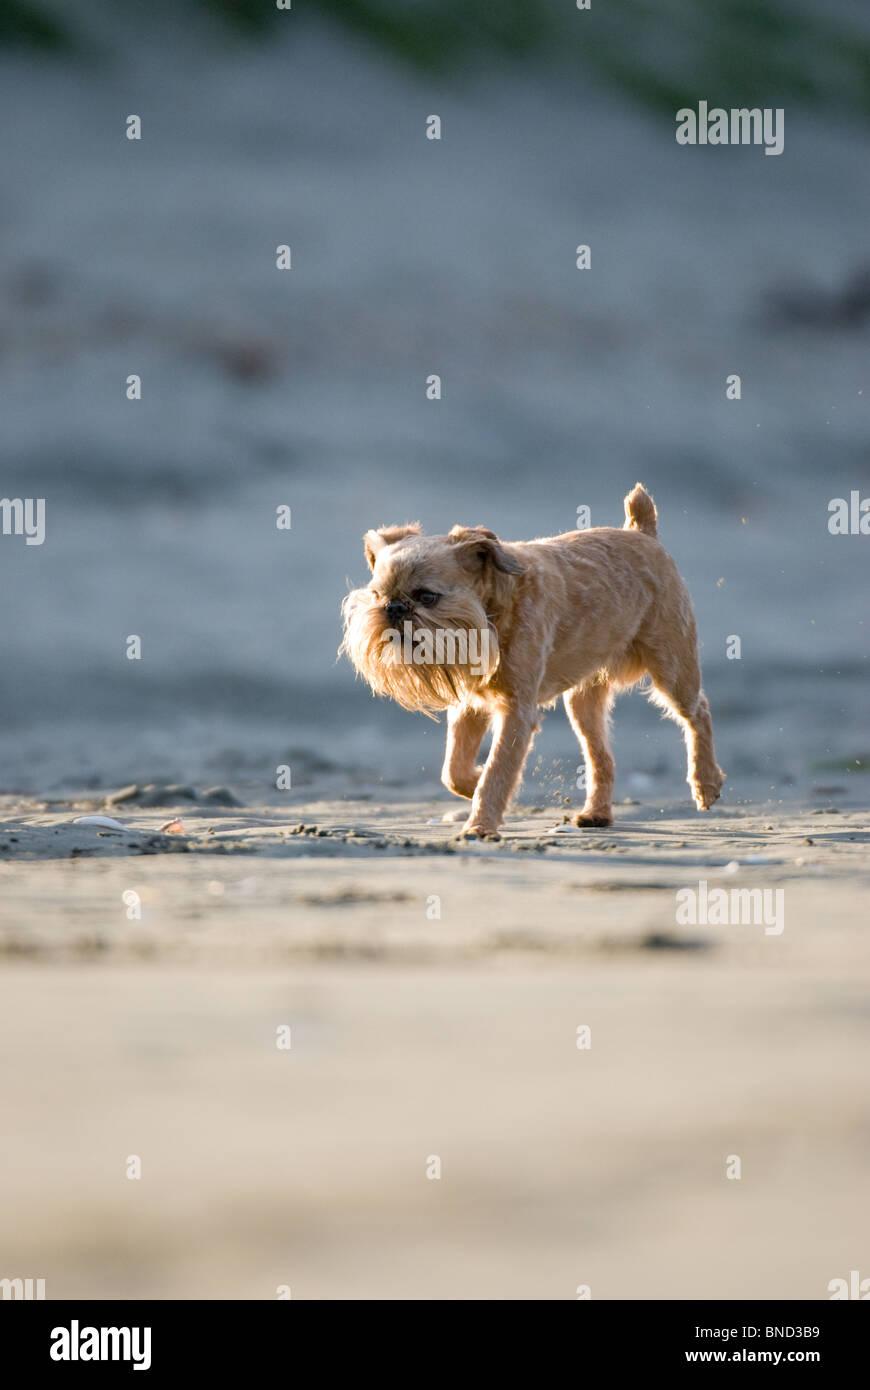 Griffon dog Canis lupus familiaris - Stock Image